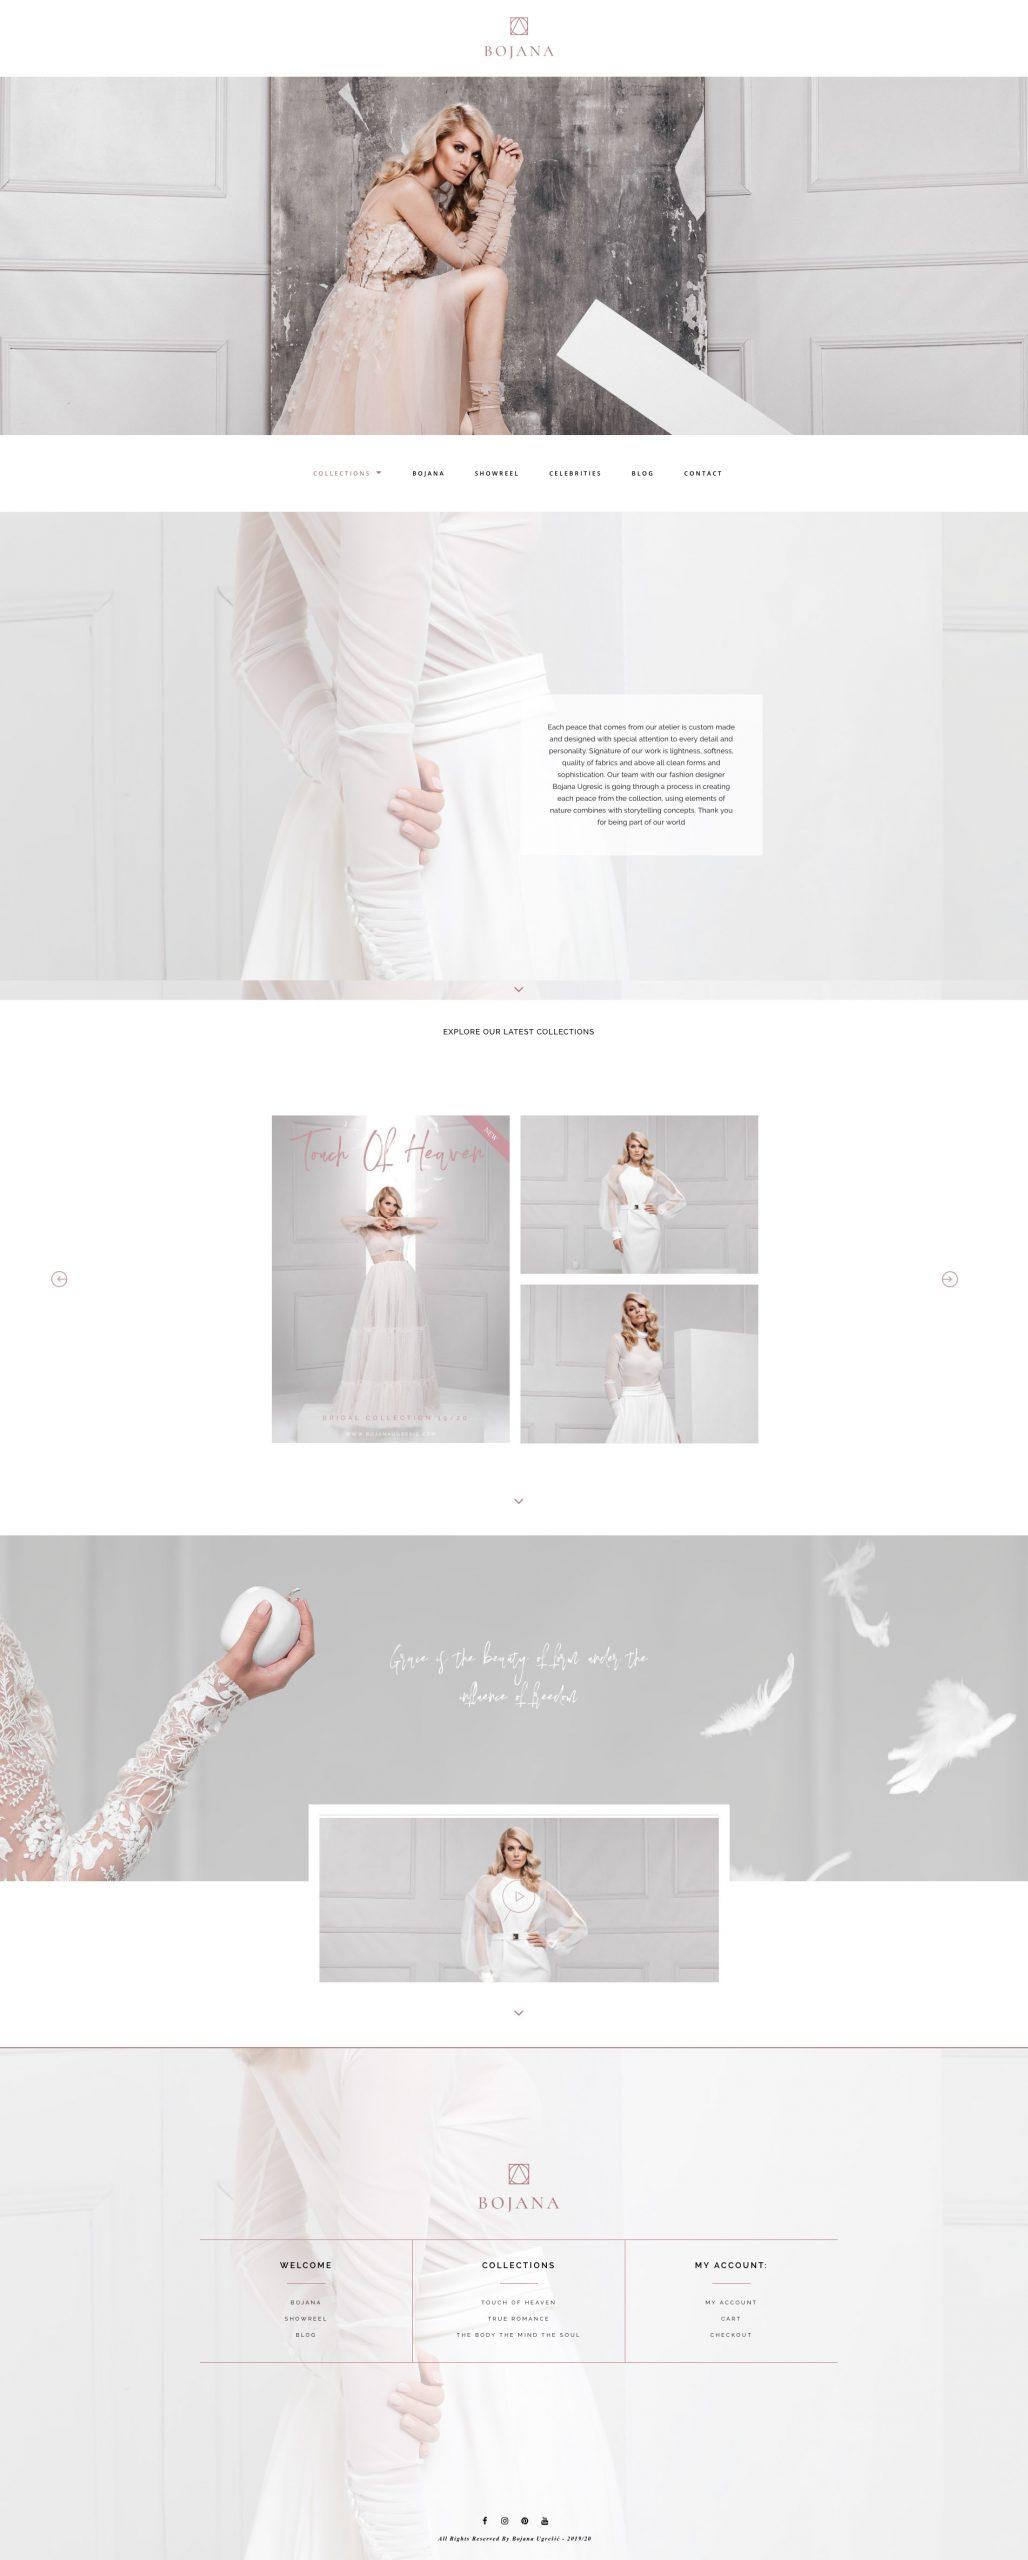 Bojana Homepage.jpg